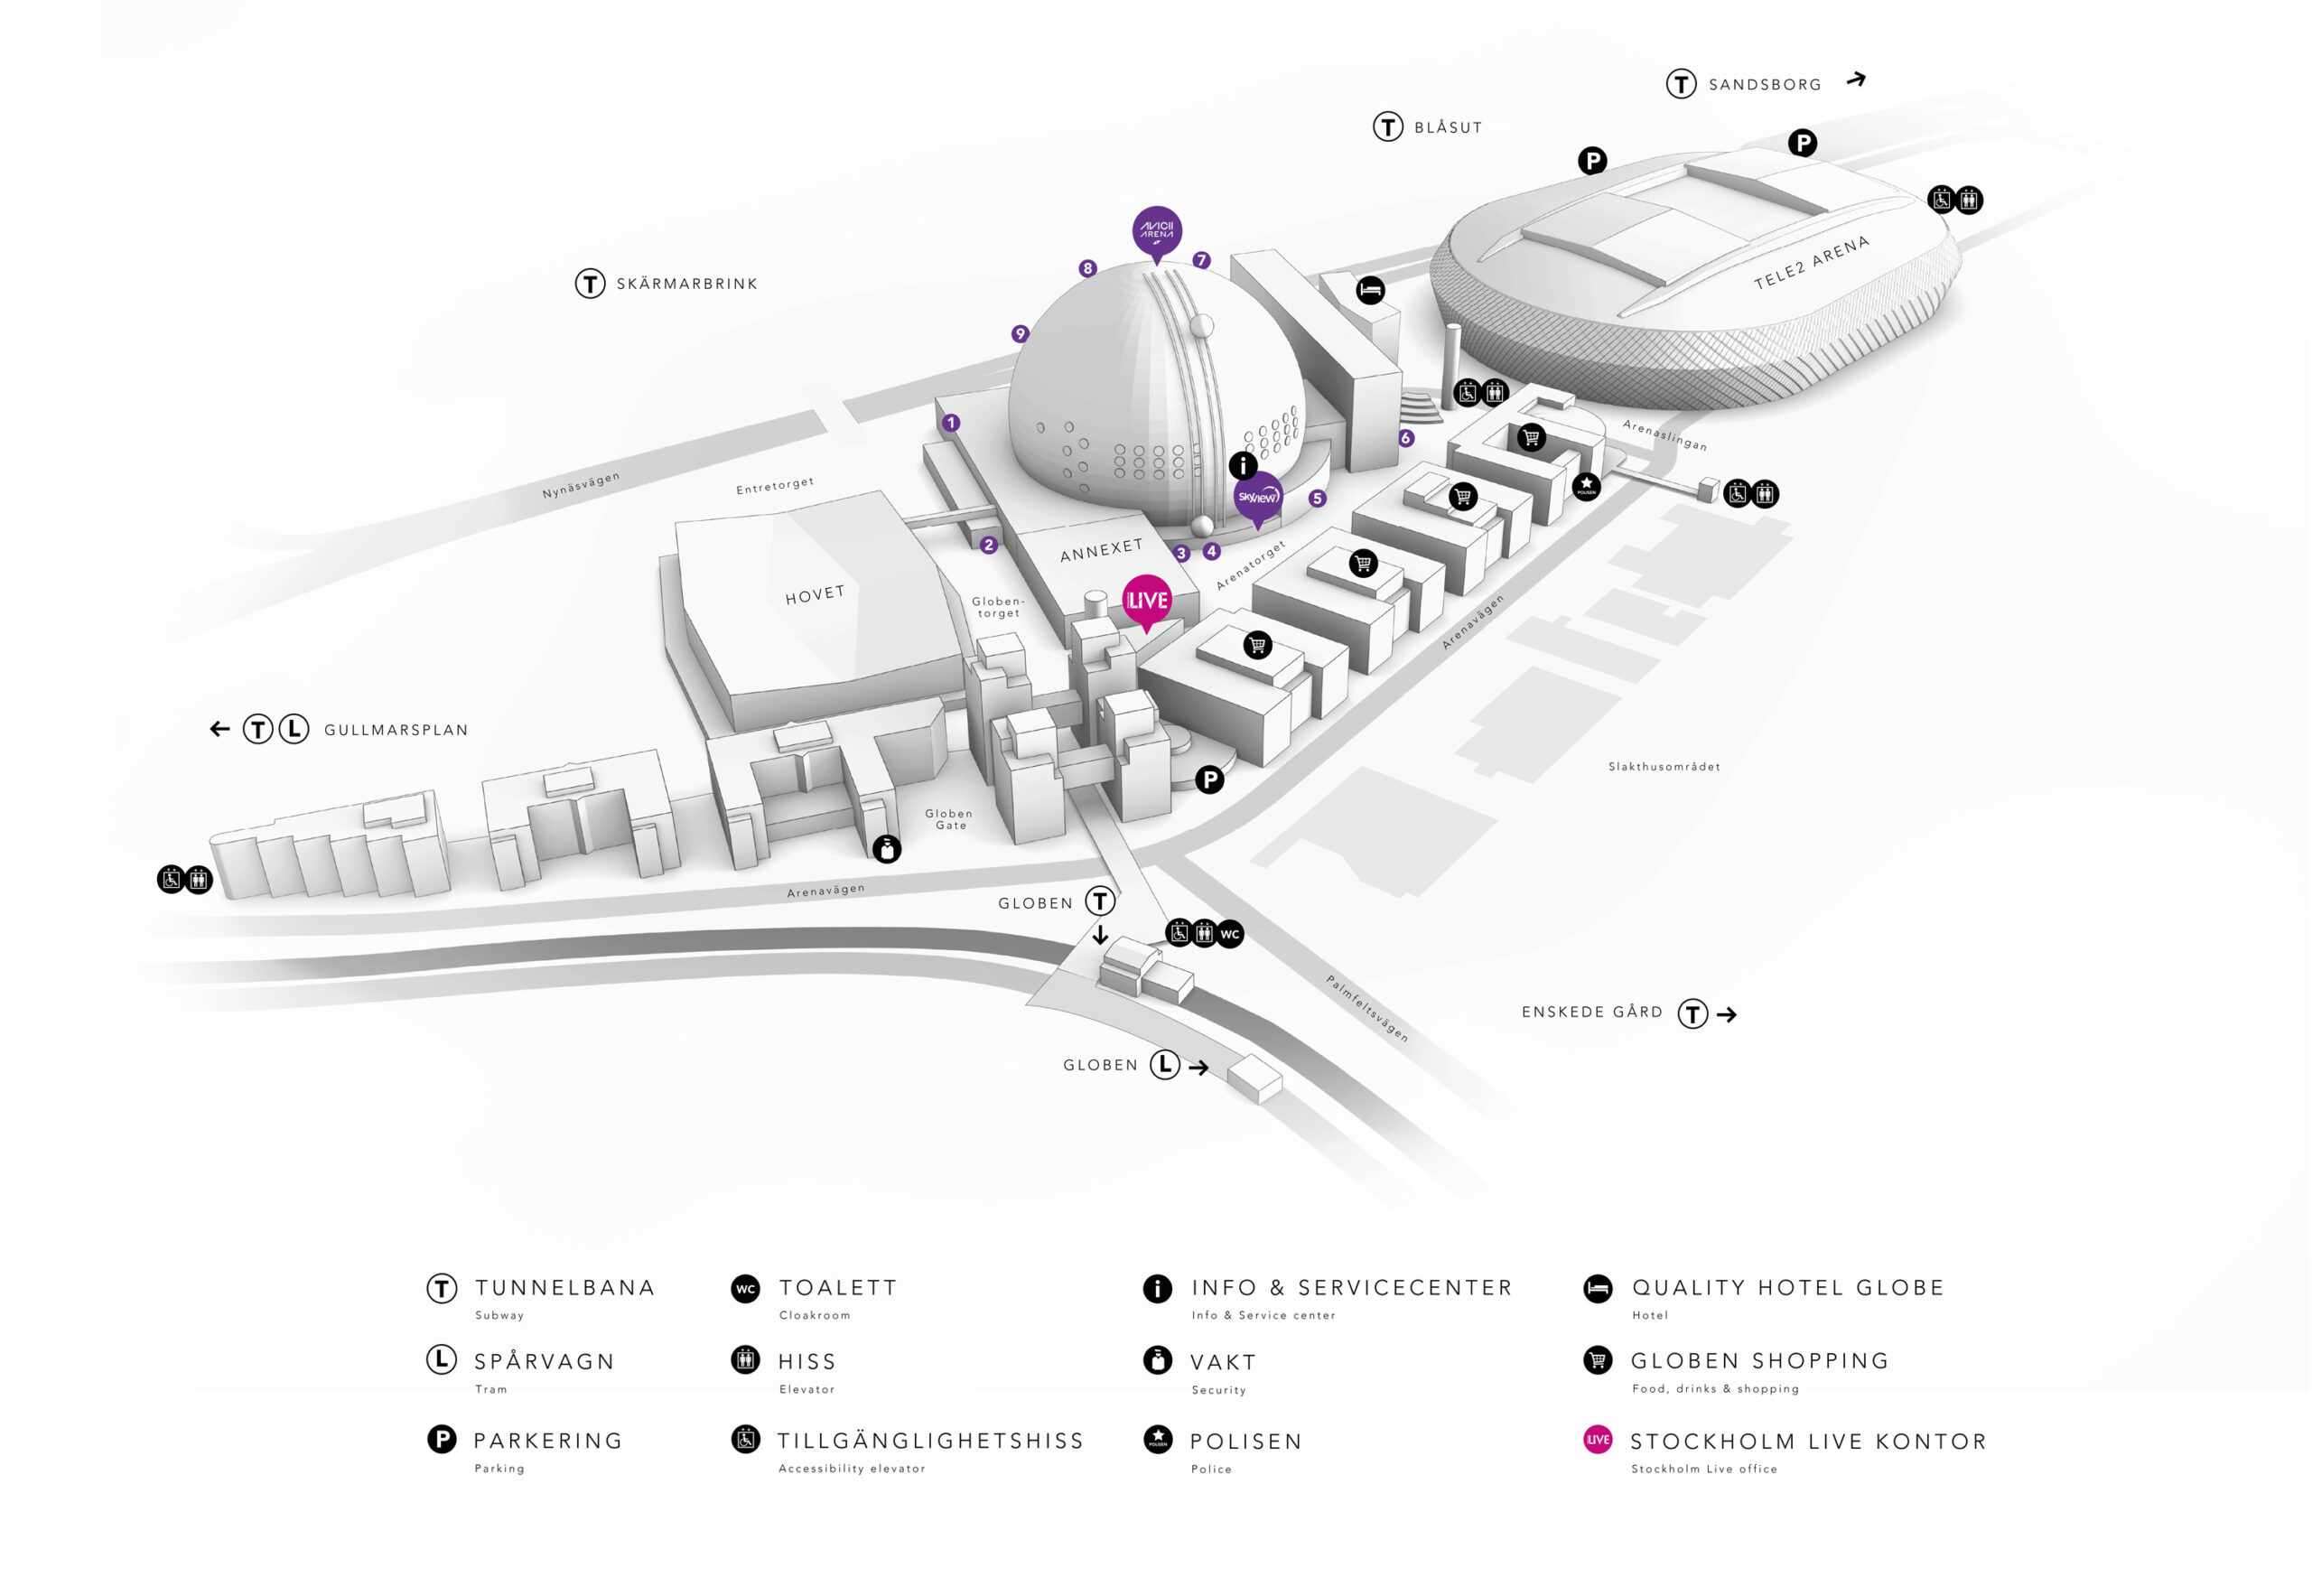 Avicii Arena – områdeskarta